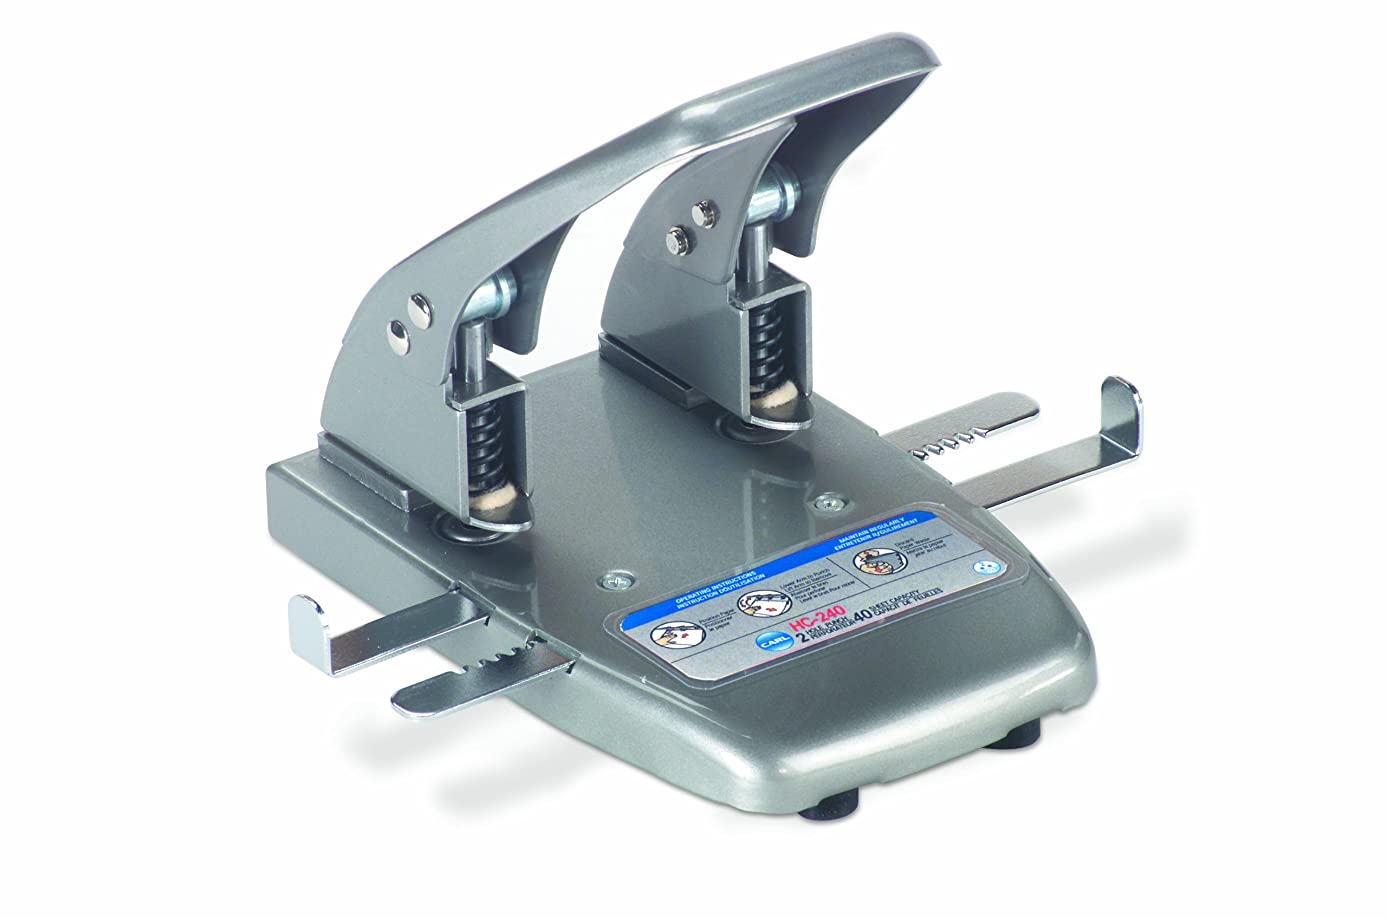 CARL 62040 40-Sheet Capacity hc-240 Two-Hole Punch, 9/32 Dia. Holes, Silver